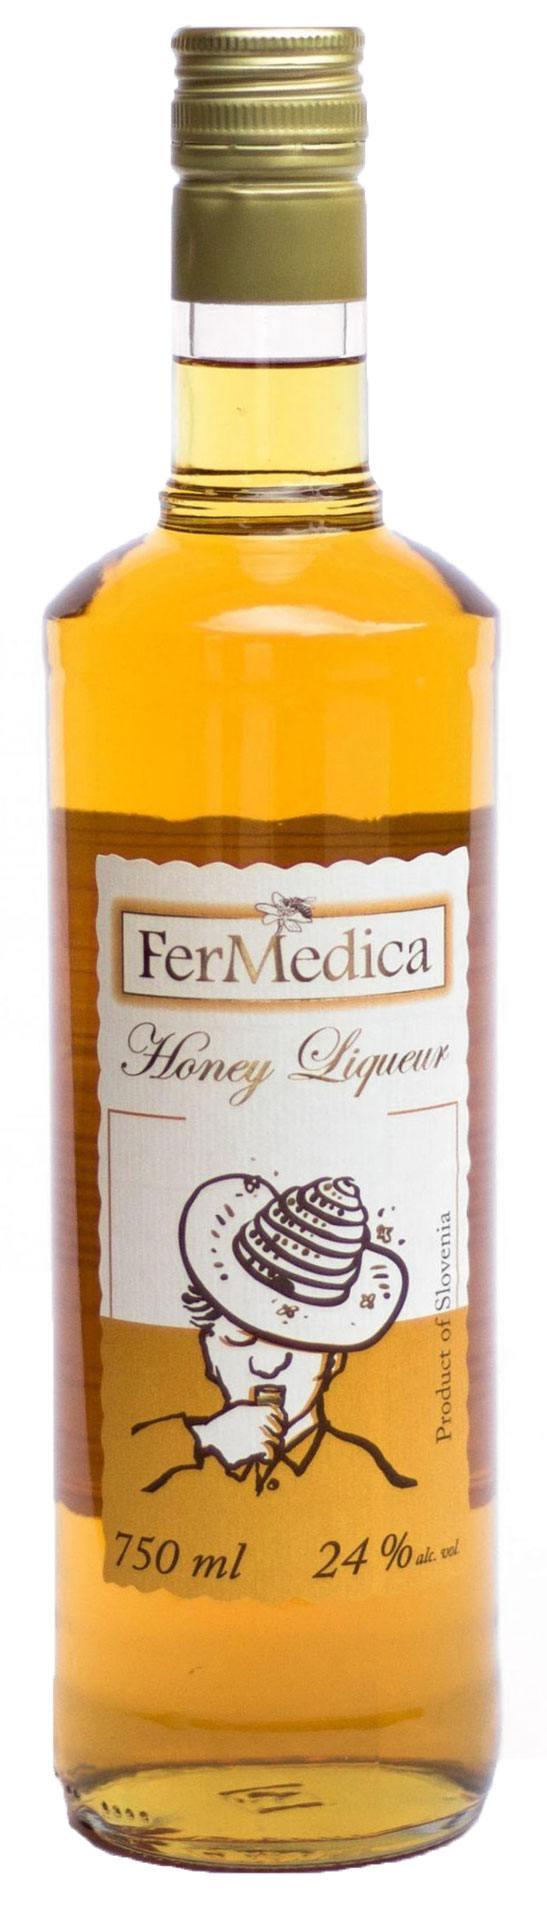 honey-liqueur-honey-brandy-fermedica-honeyliqueur-scaled-4